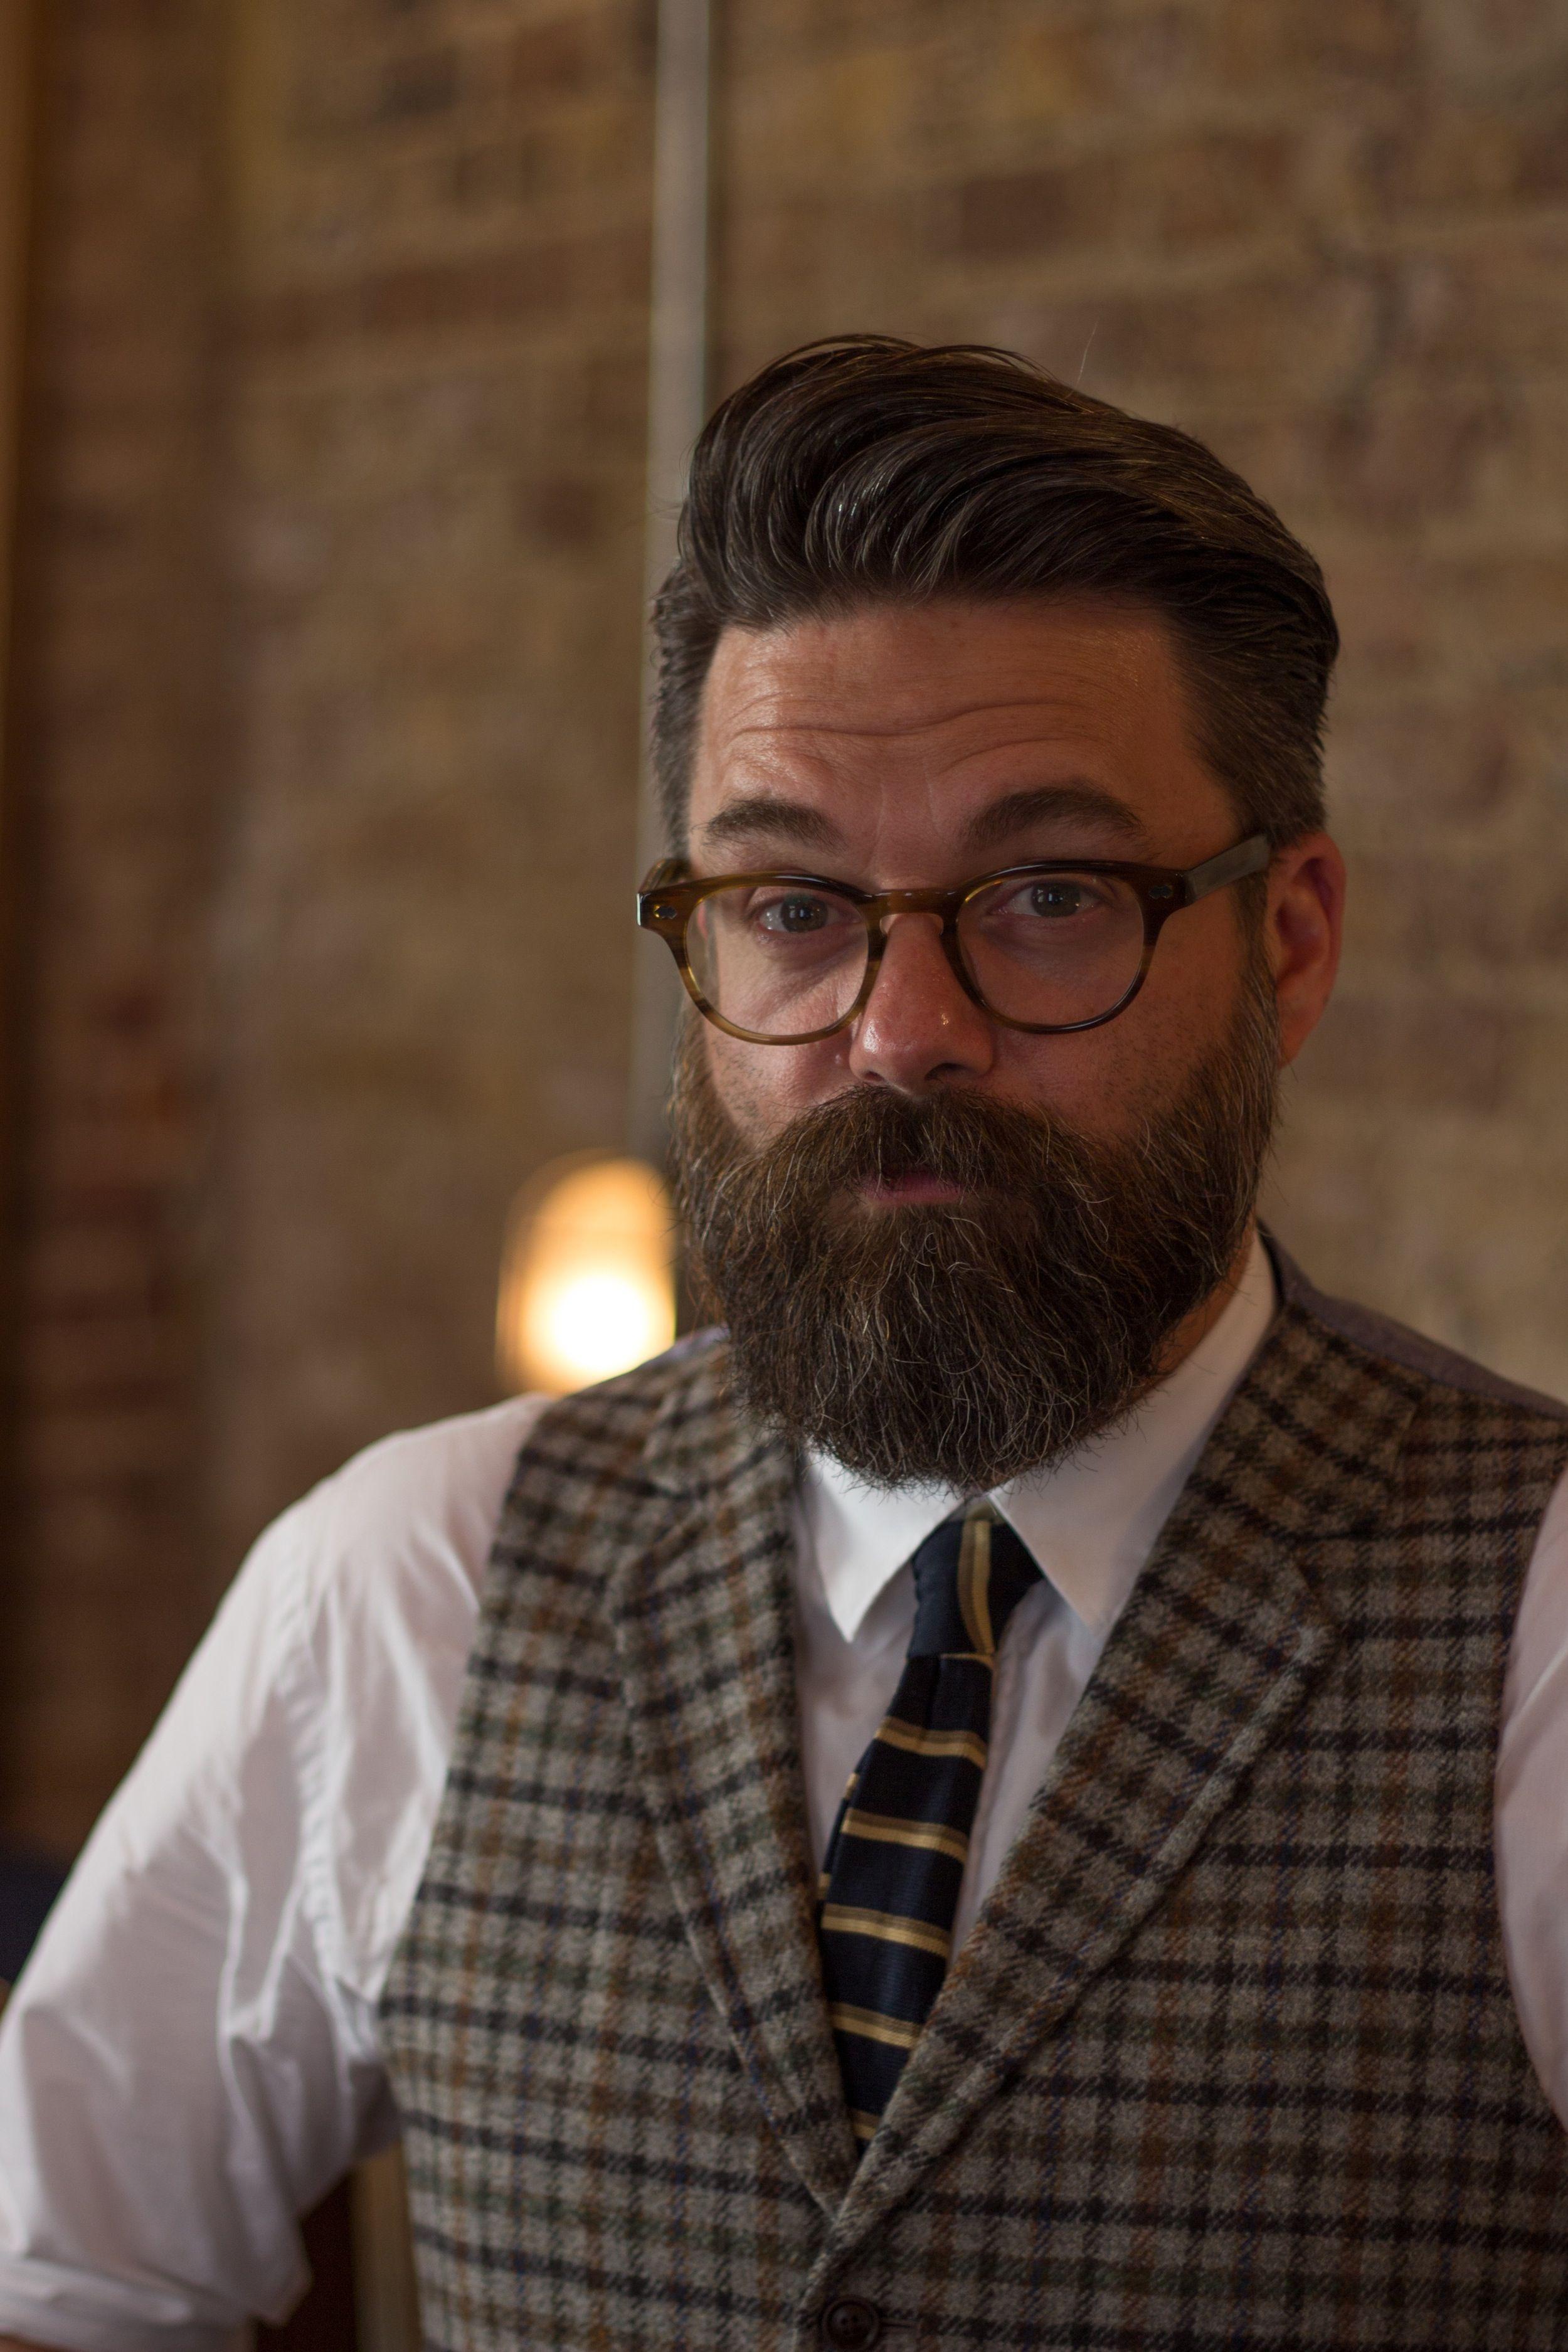 Modern pompadour beard - George V Beard Heavy Moustache Worn As A Handlebar Solid In The Chin